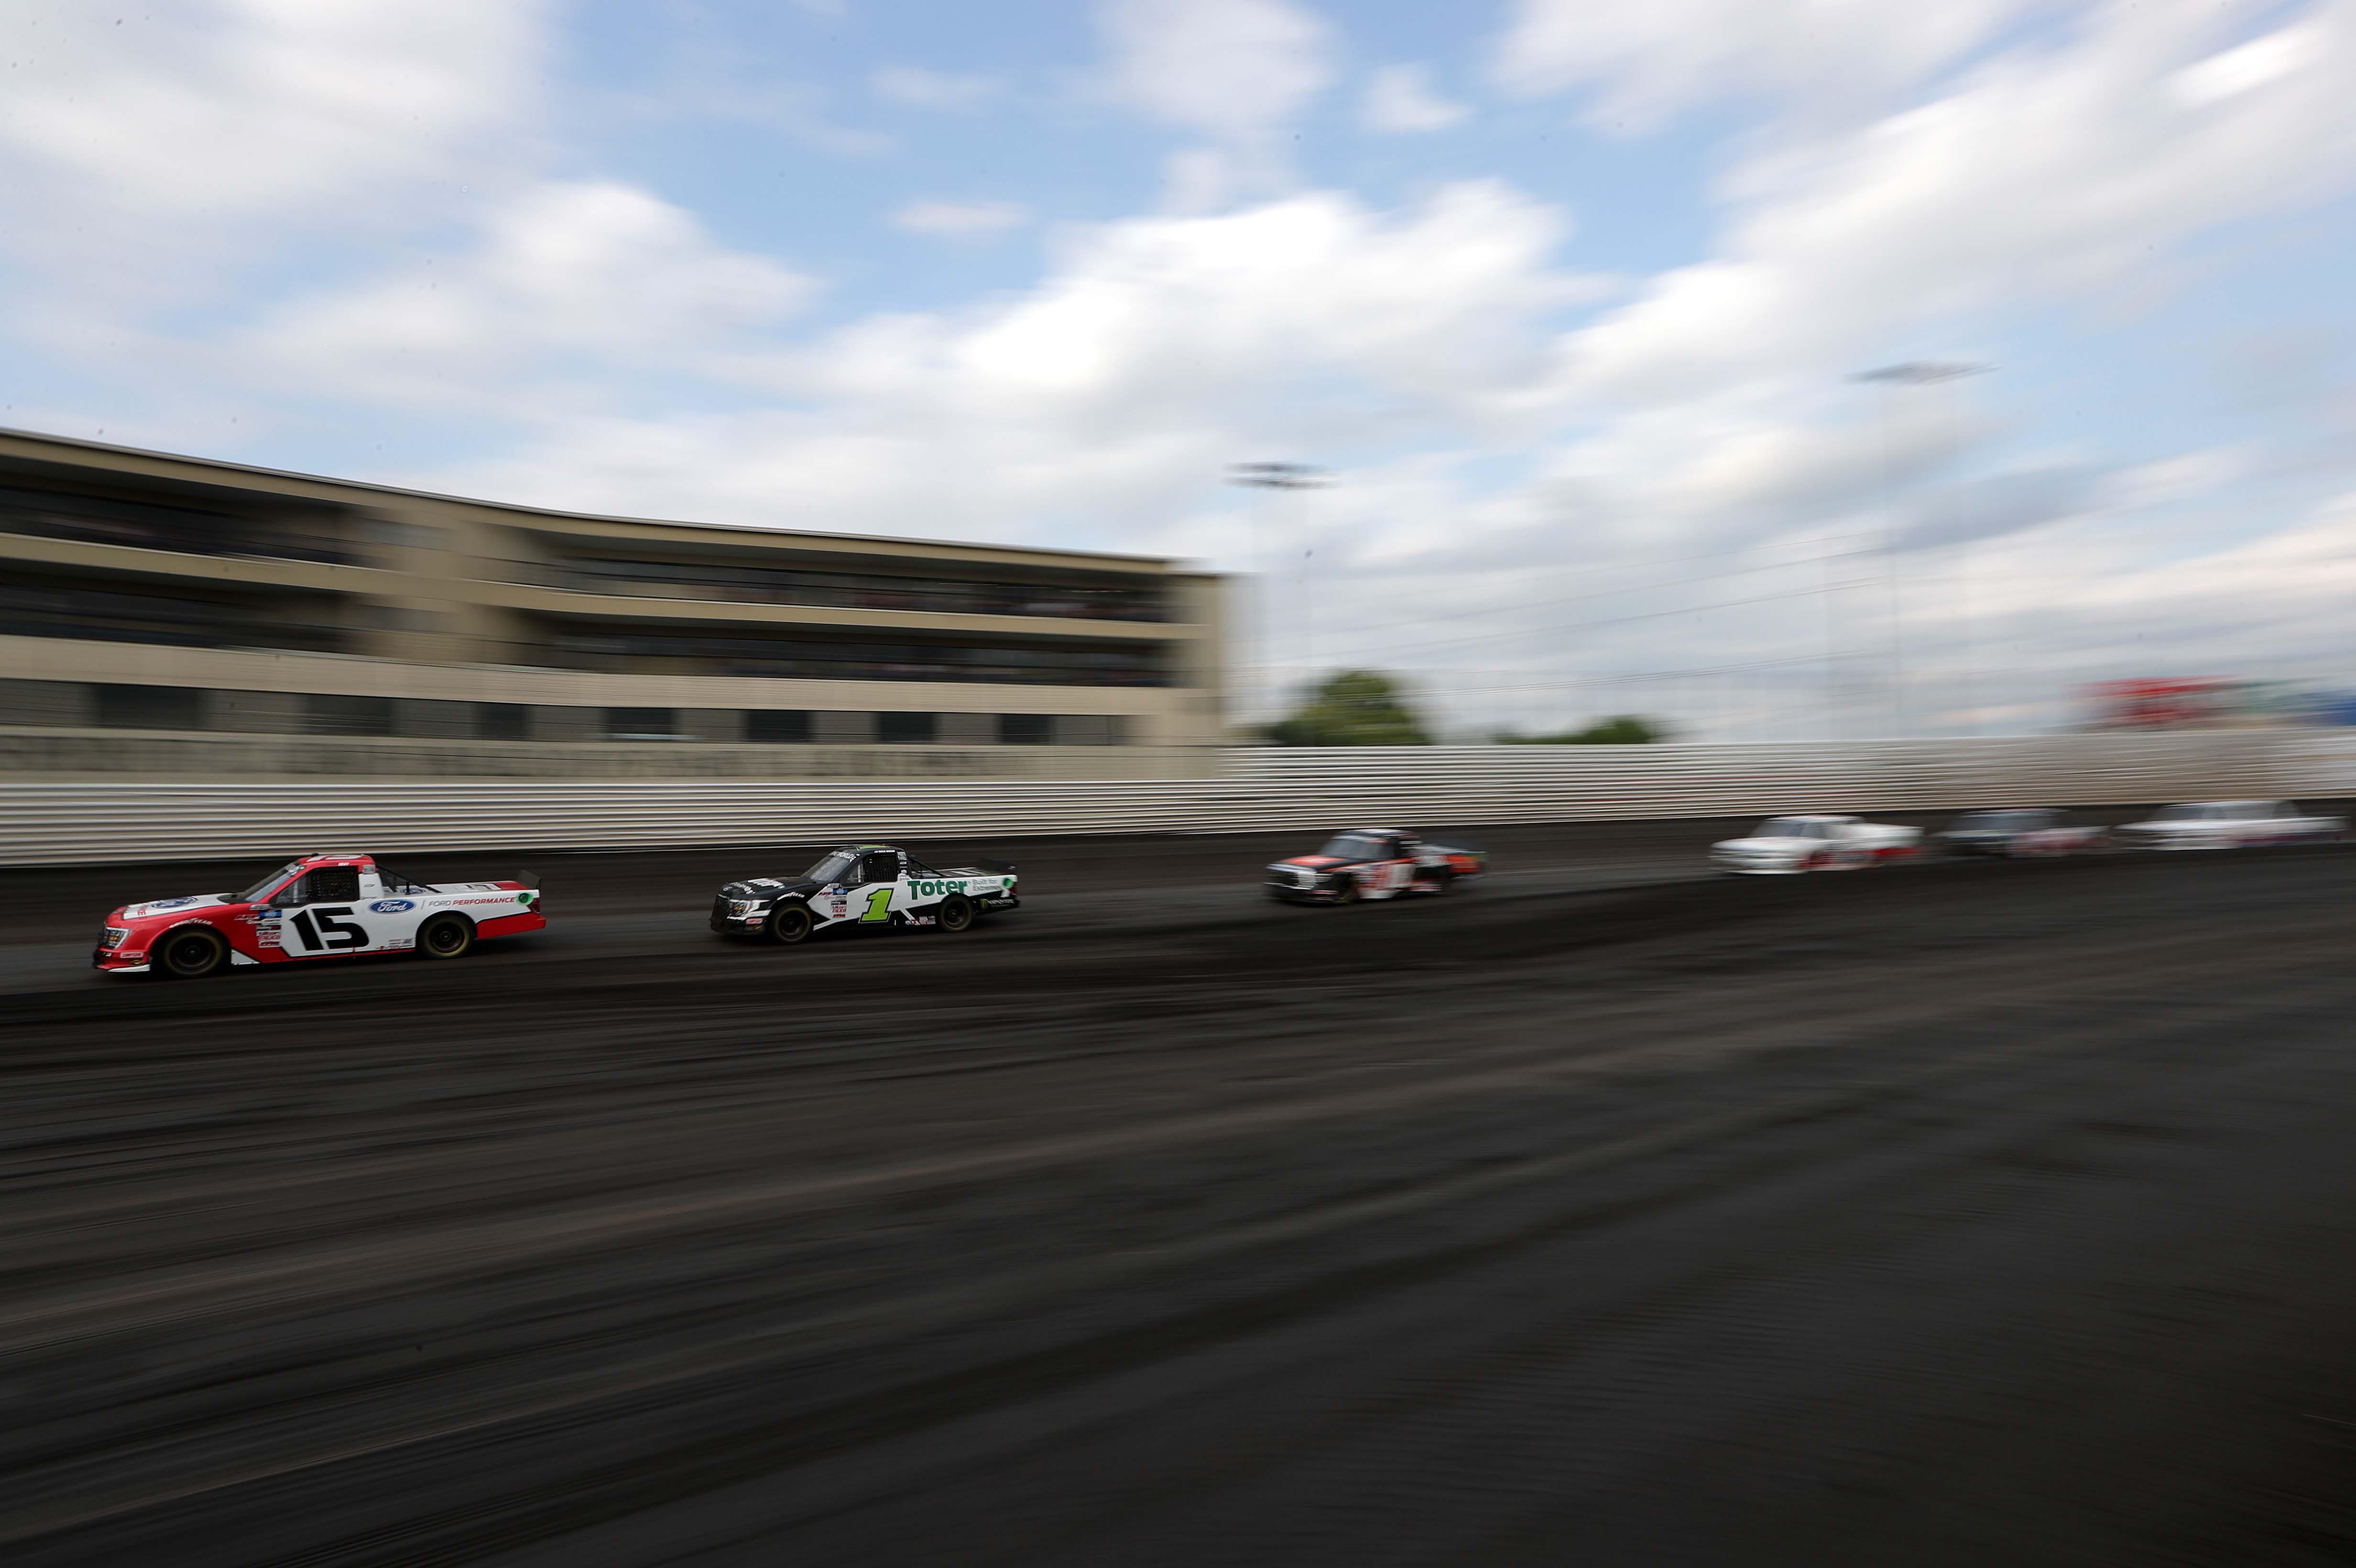 Tanner Gray, Hailie Deegan - Knoxville Raceway Dirt Track - NASCAR Truck Series